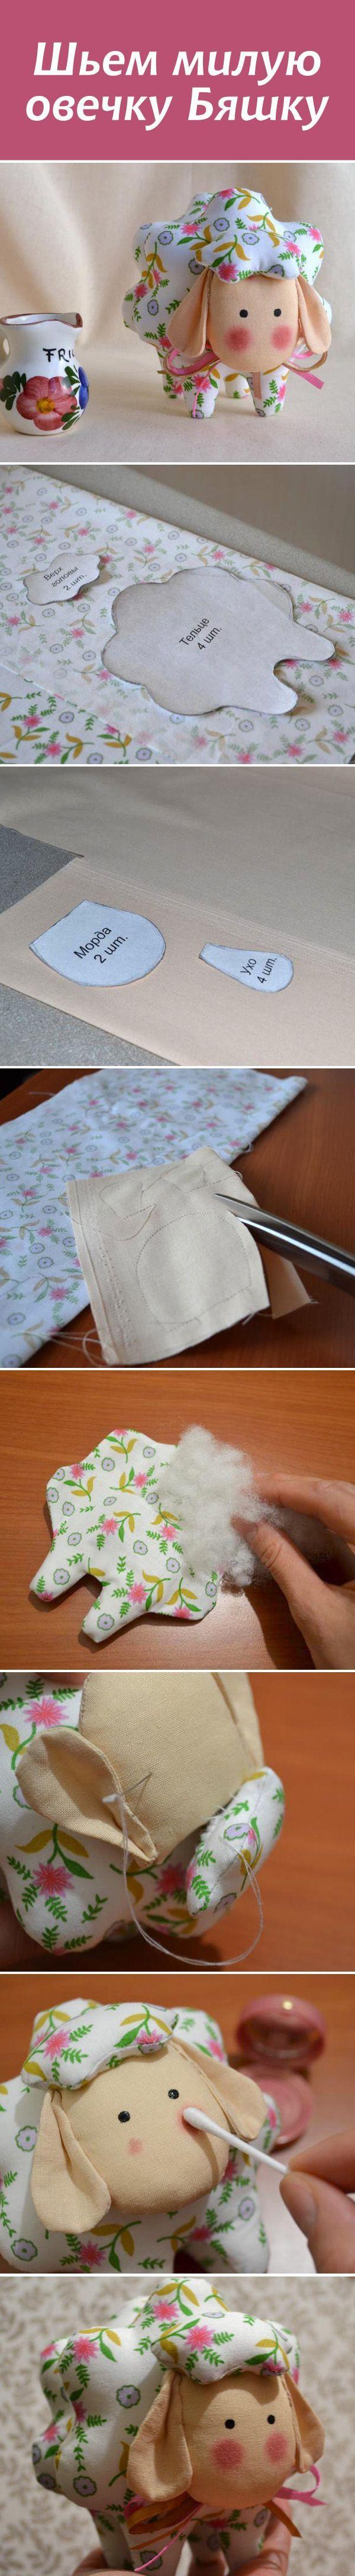 Шьем милую овечку Бяшку #diy #sewing #lamb #toy #tutorial: